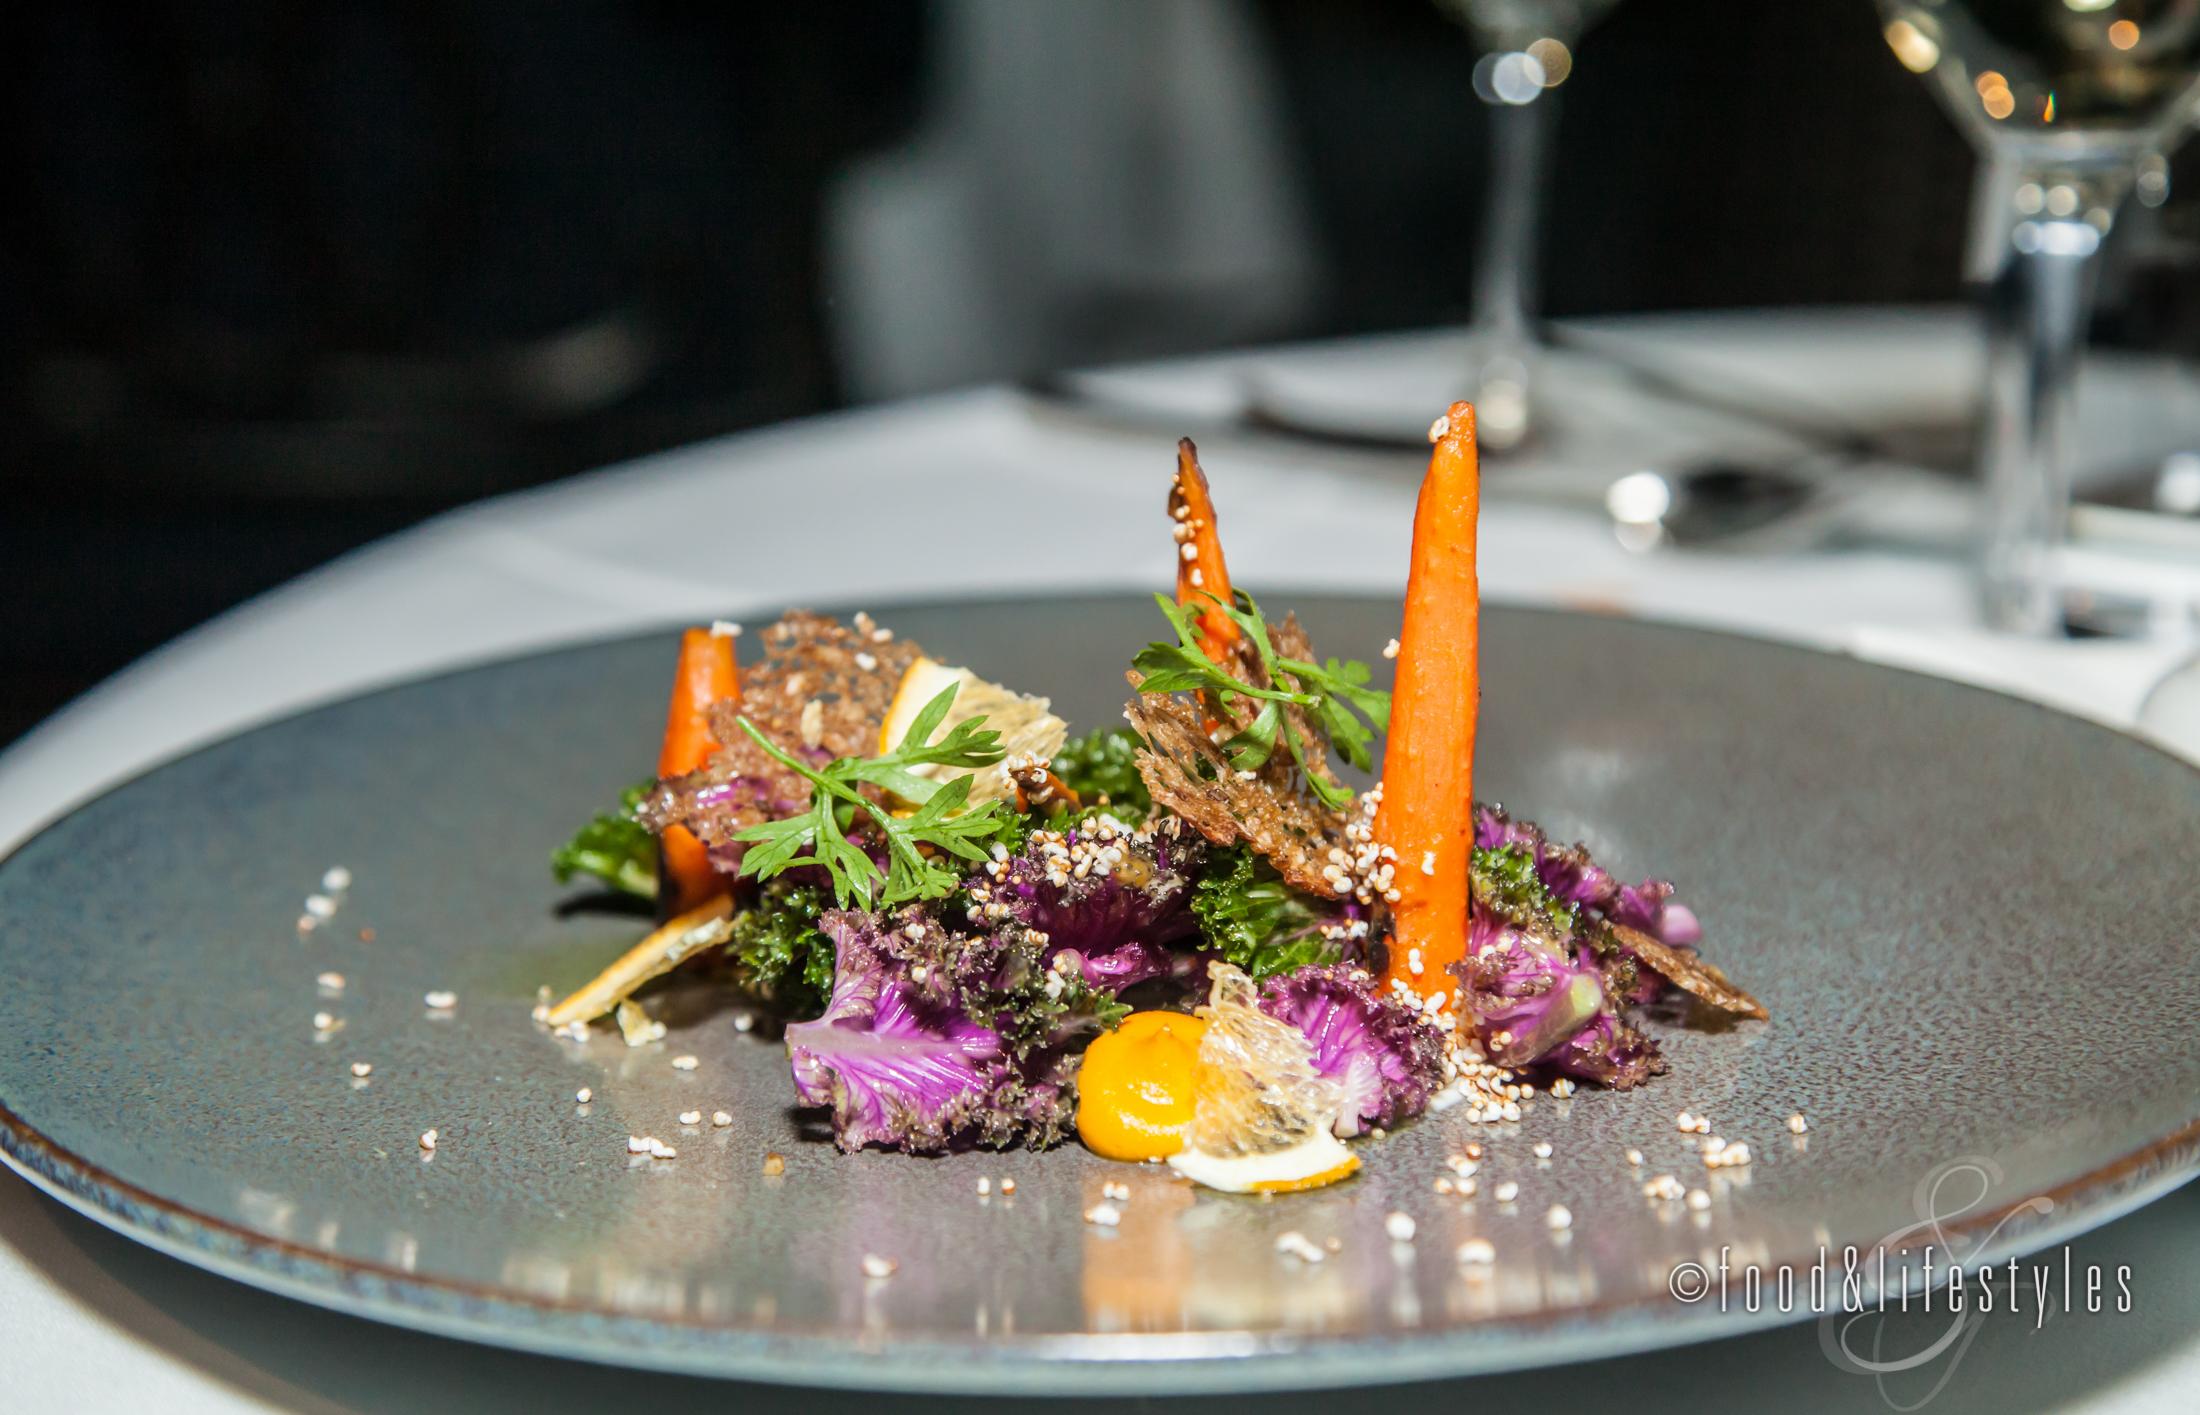 Kale salad with carrots, robiola, amaranth and orange blossom vinaigrette